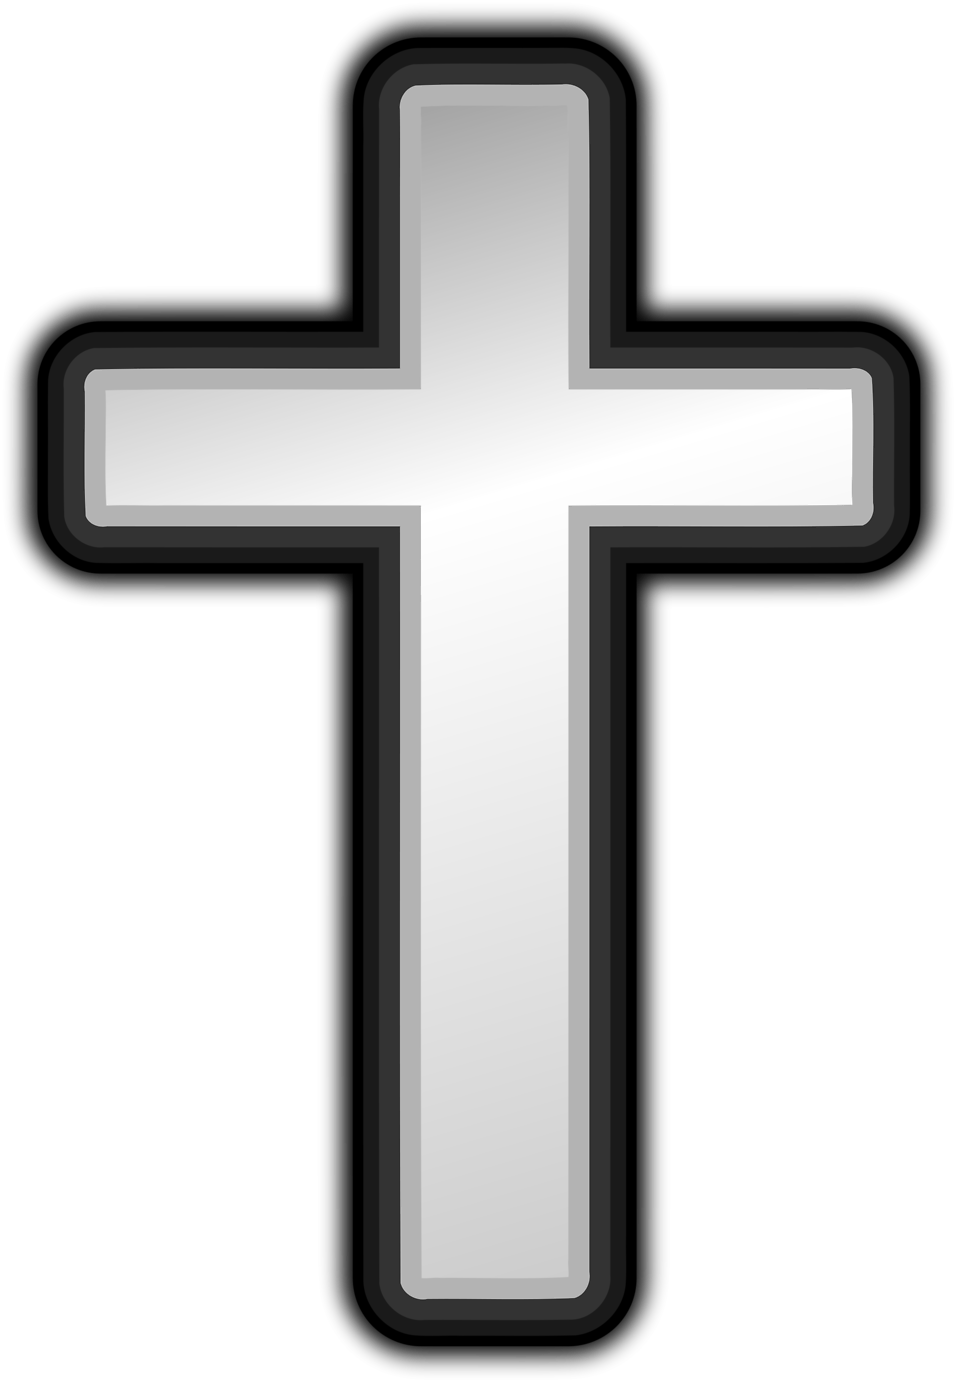 958x1384 Cross Free Stock Photo Illustration Of A White Cross